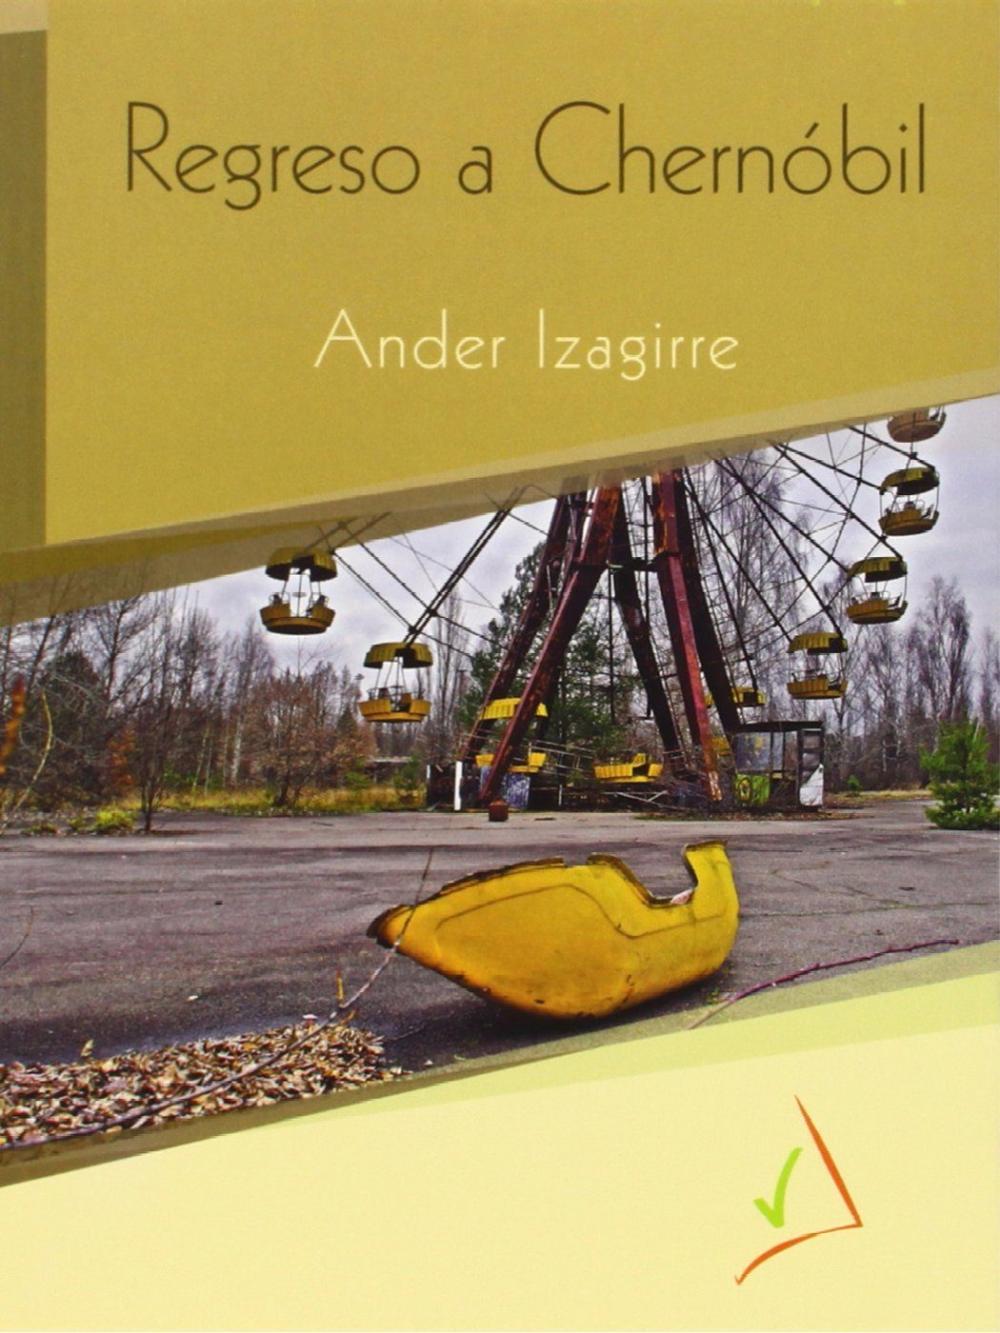 REGRESO A CHERNOBIL